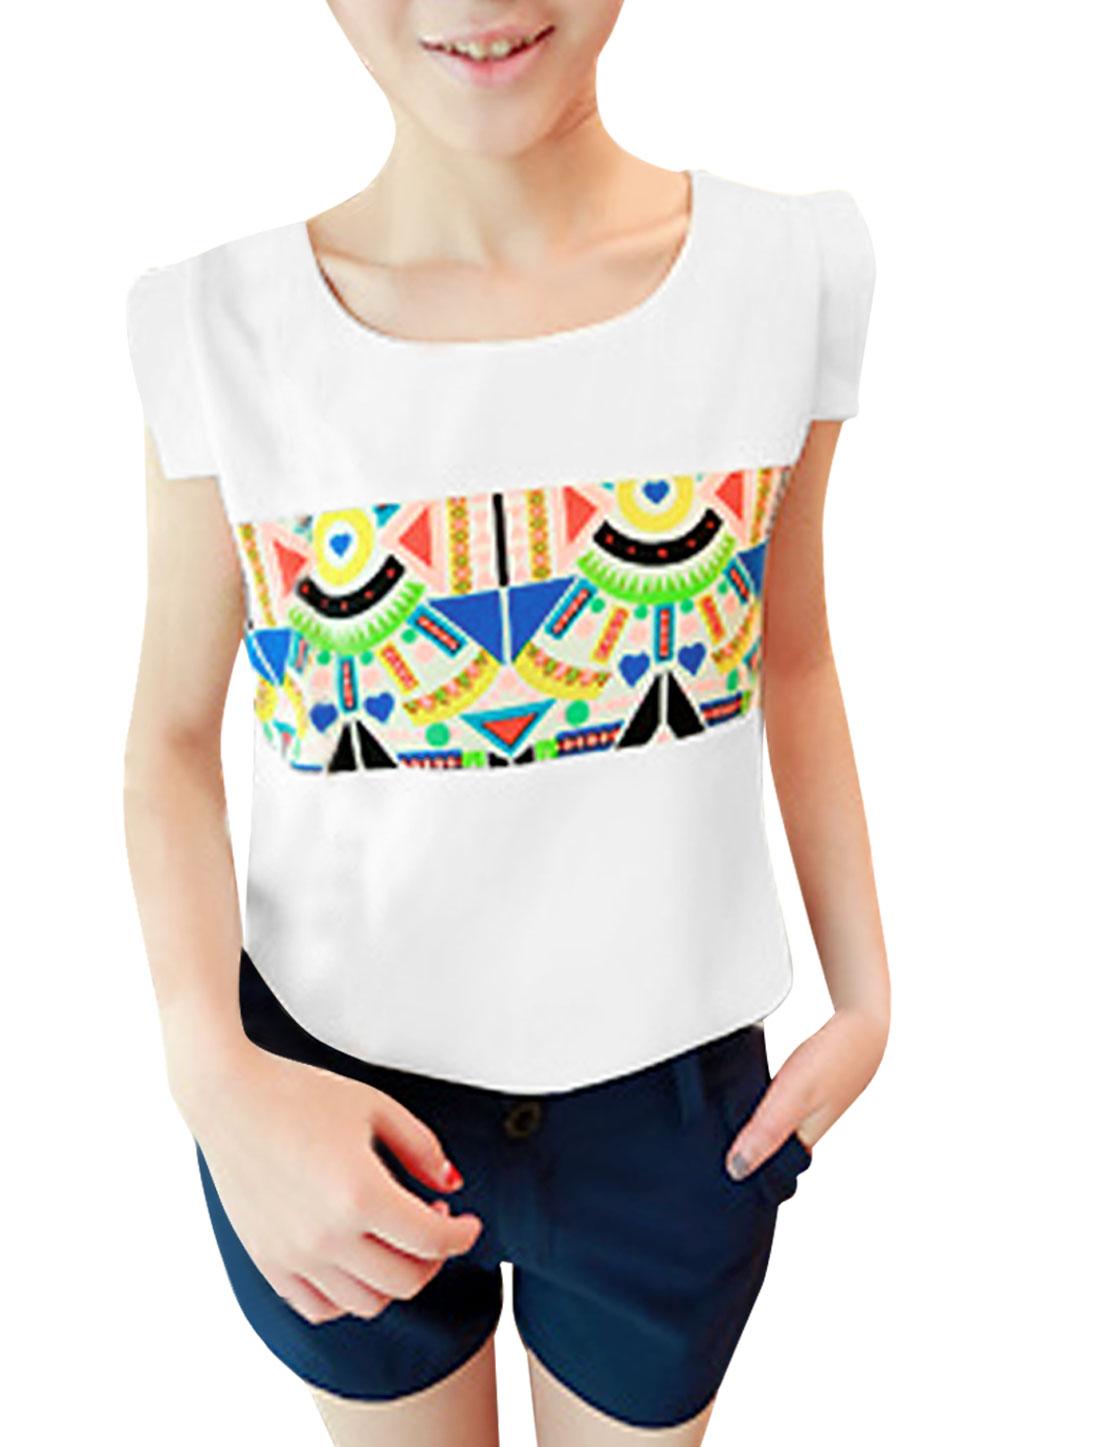 Women Sleeveless Round Neck Design Semi Sheer Chiffon Blouse S White